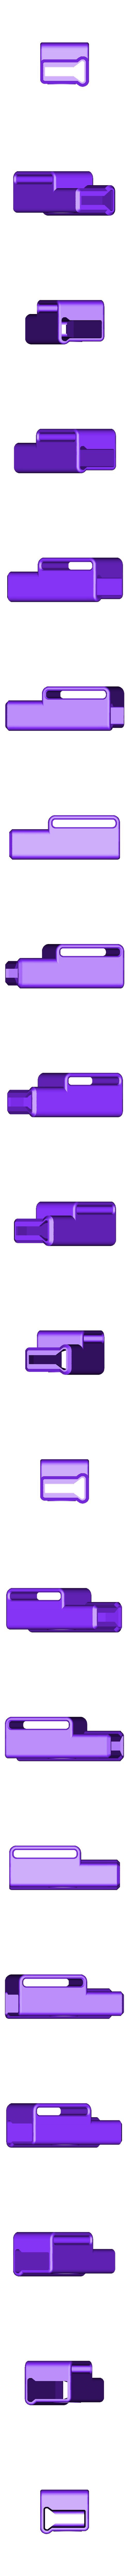 SW_380_Clip_Holster.stl Télécharger fichier STL gratuit Smith & Wesson .380 EZ Clip Holster • Plan à imprimer en 3D, skiidlive